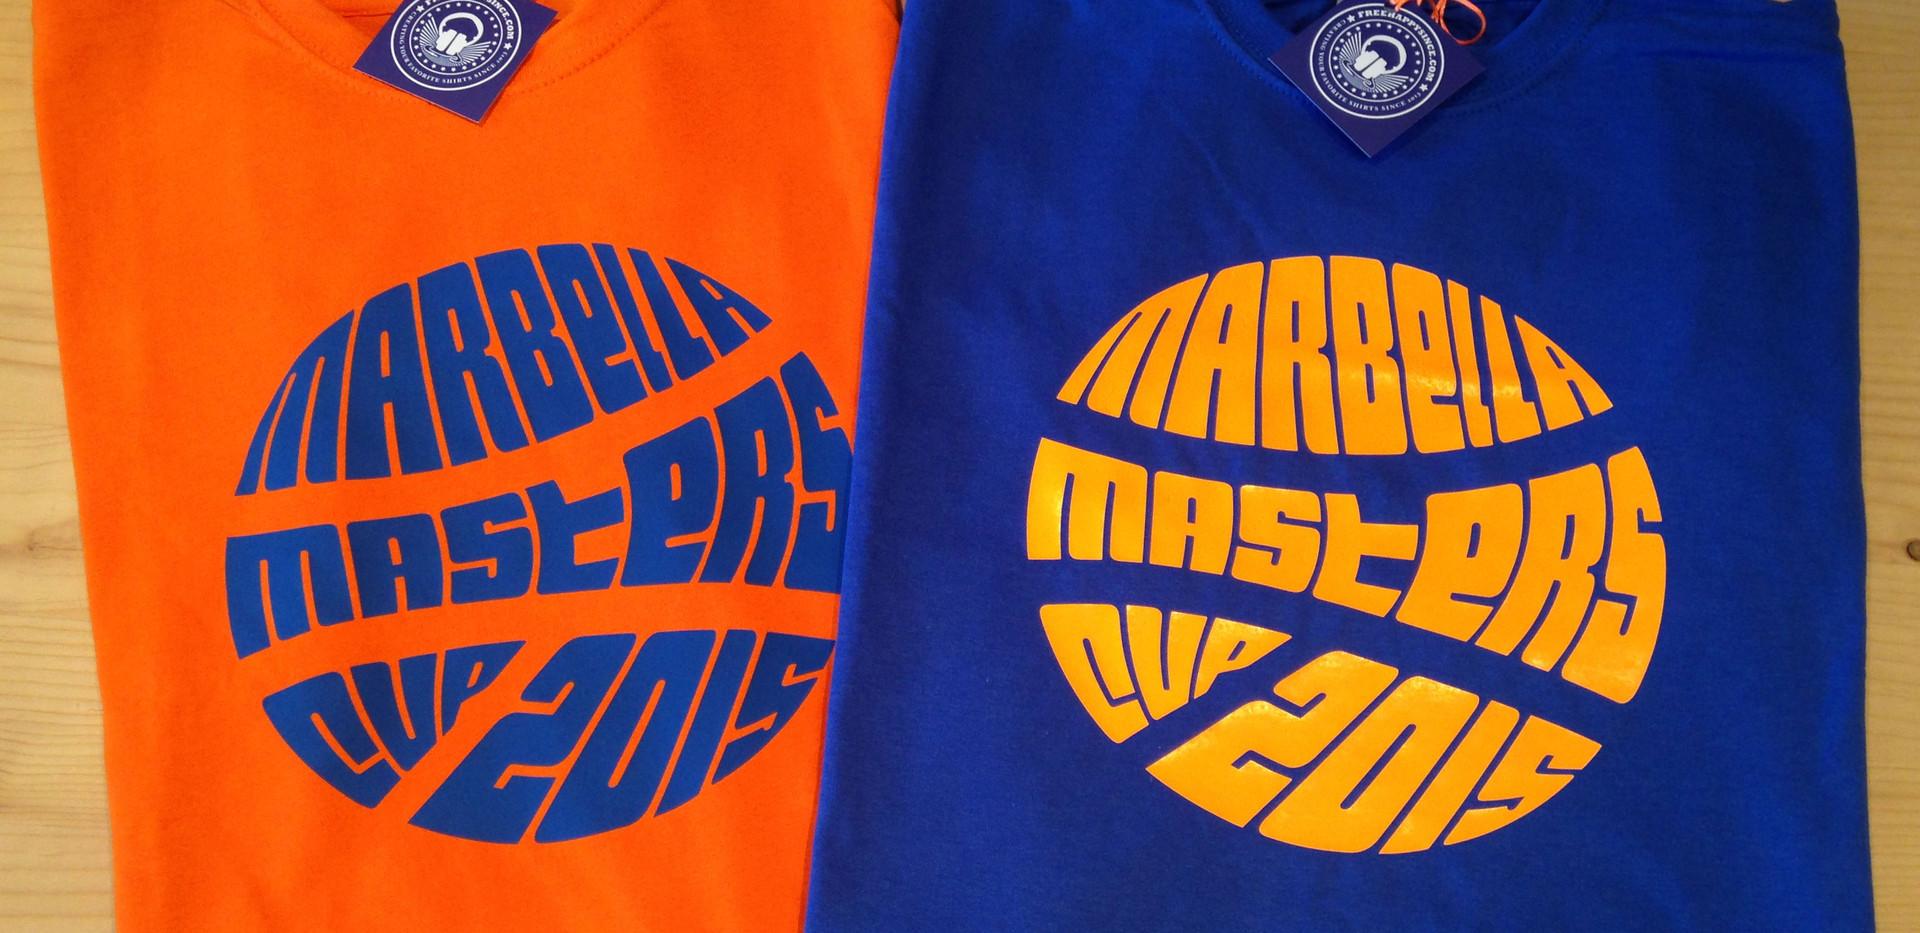 camisetas invertidas azul/naranja fhsince